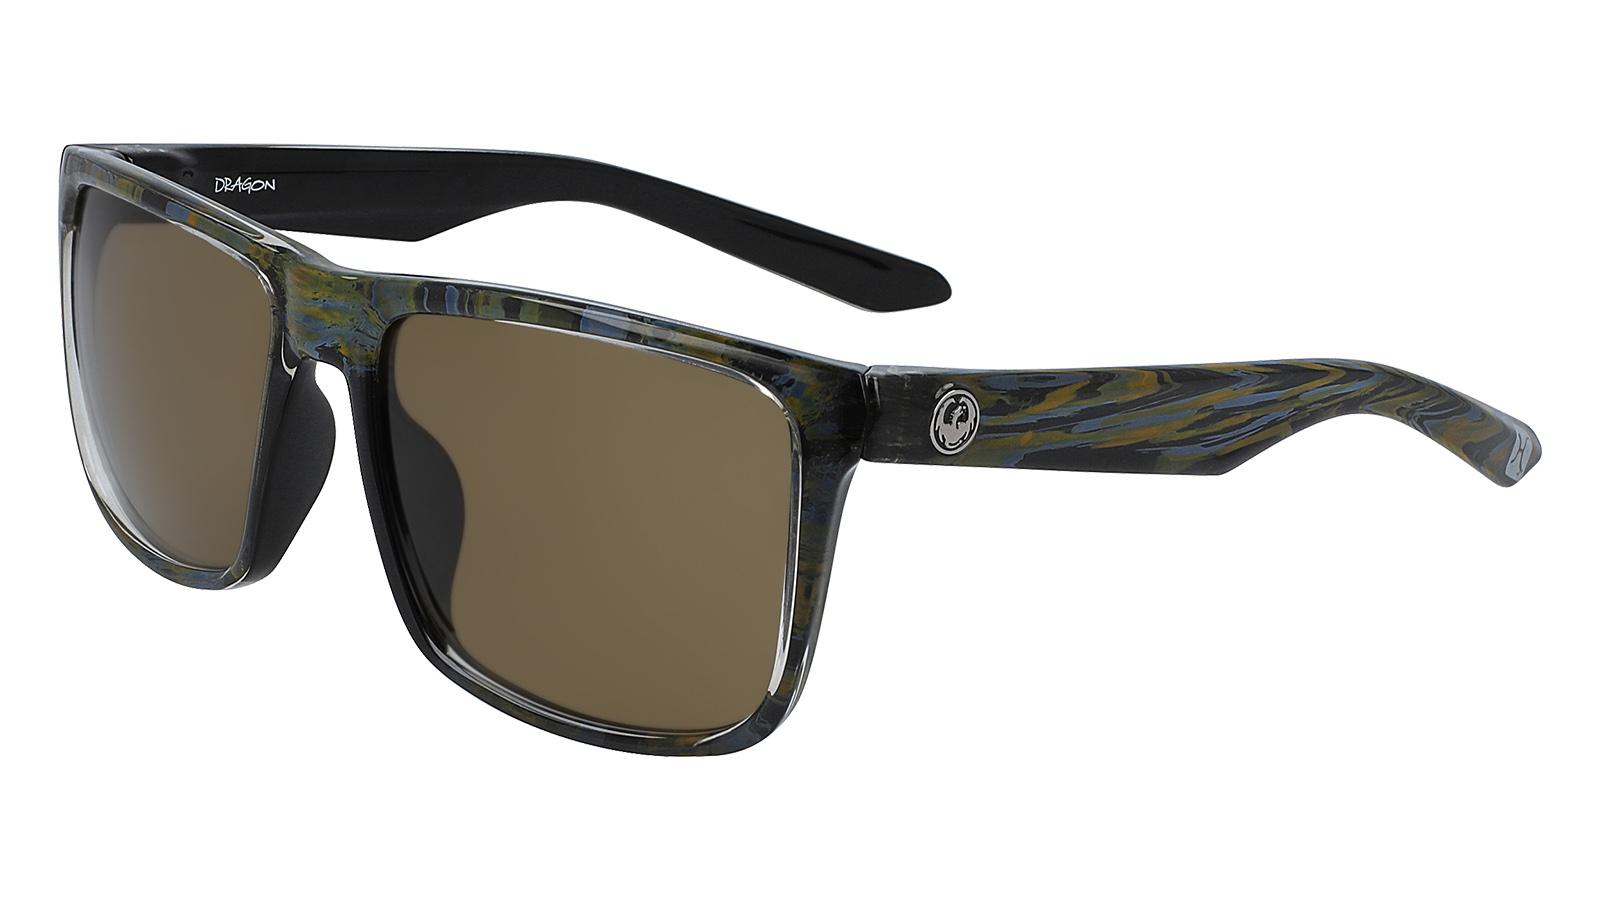 Dragon 2020 Sunglasses